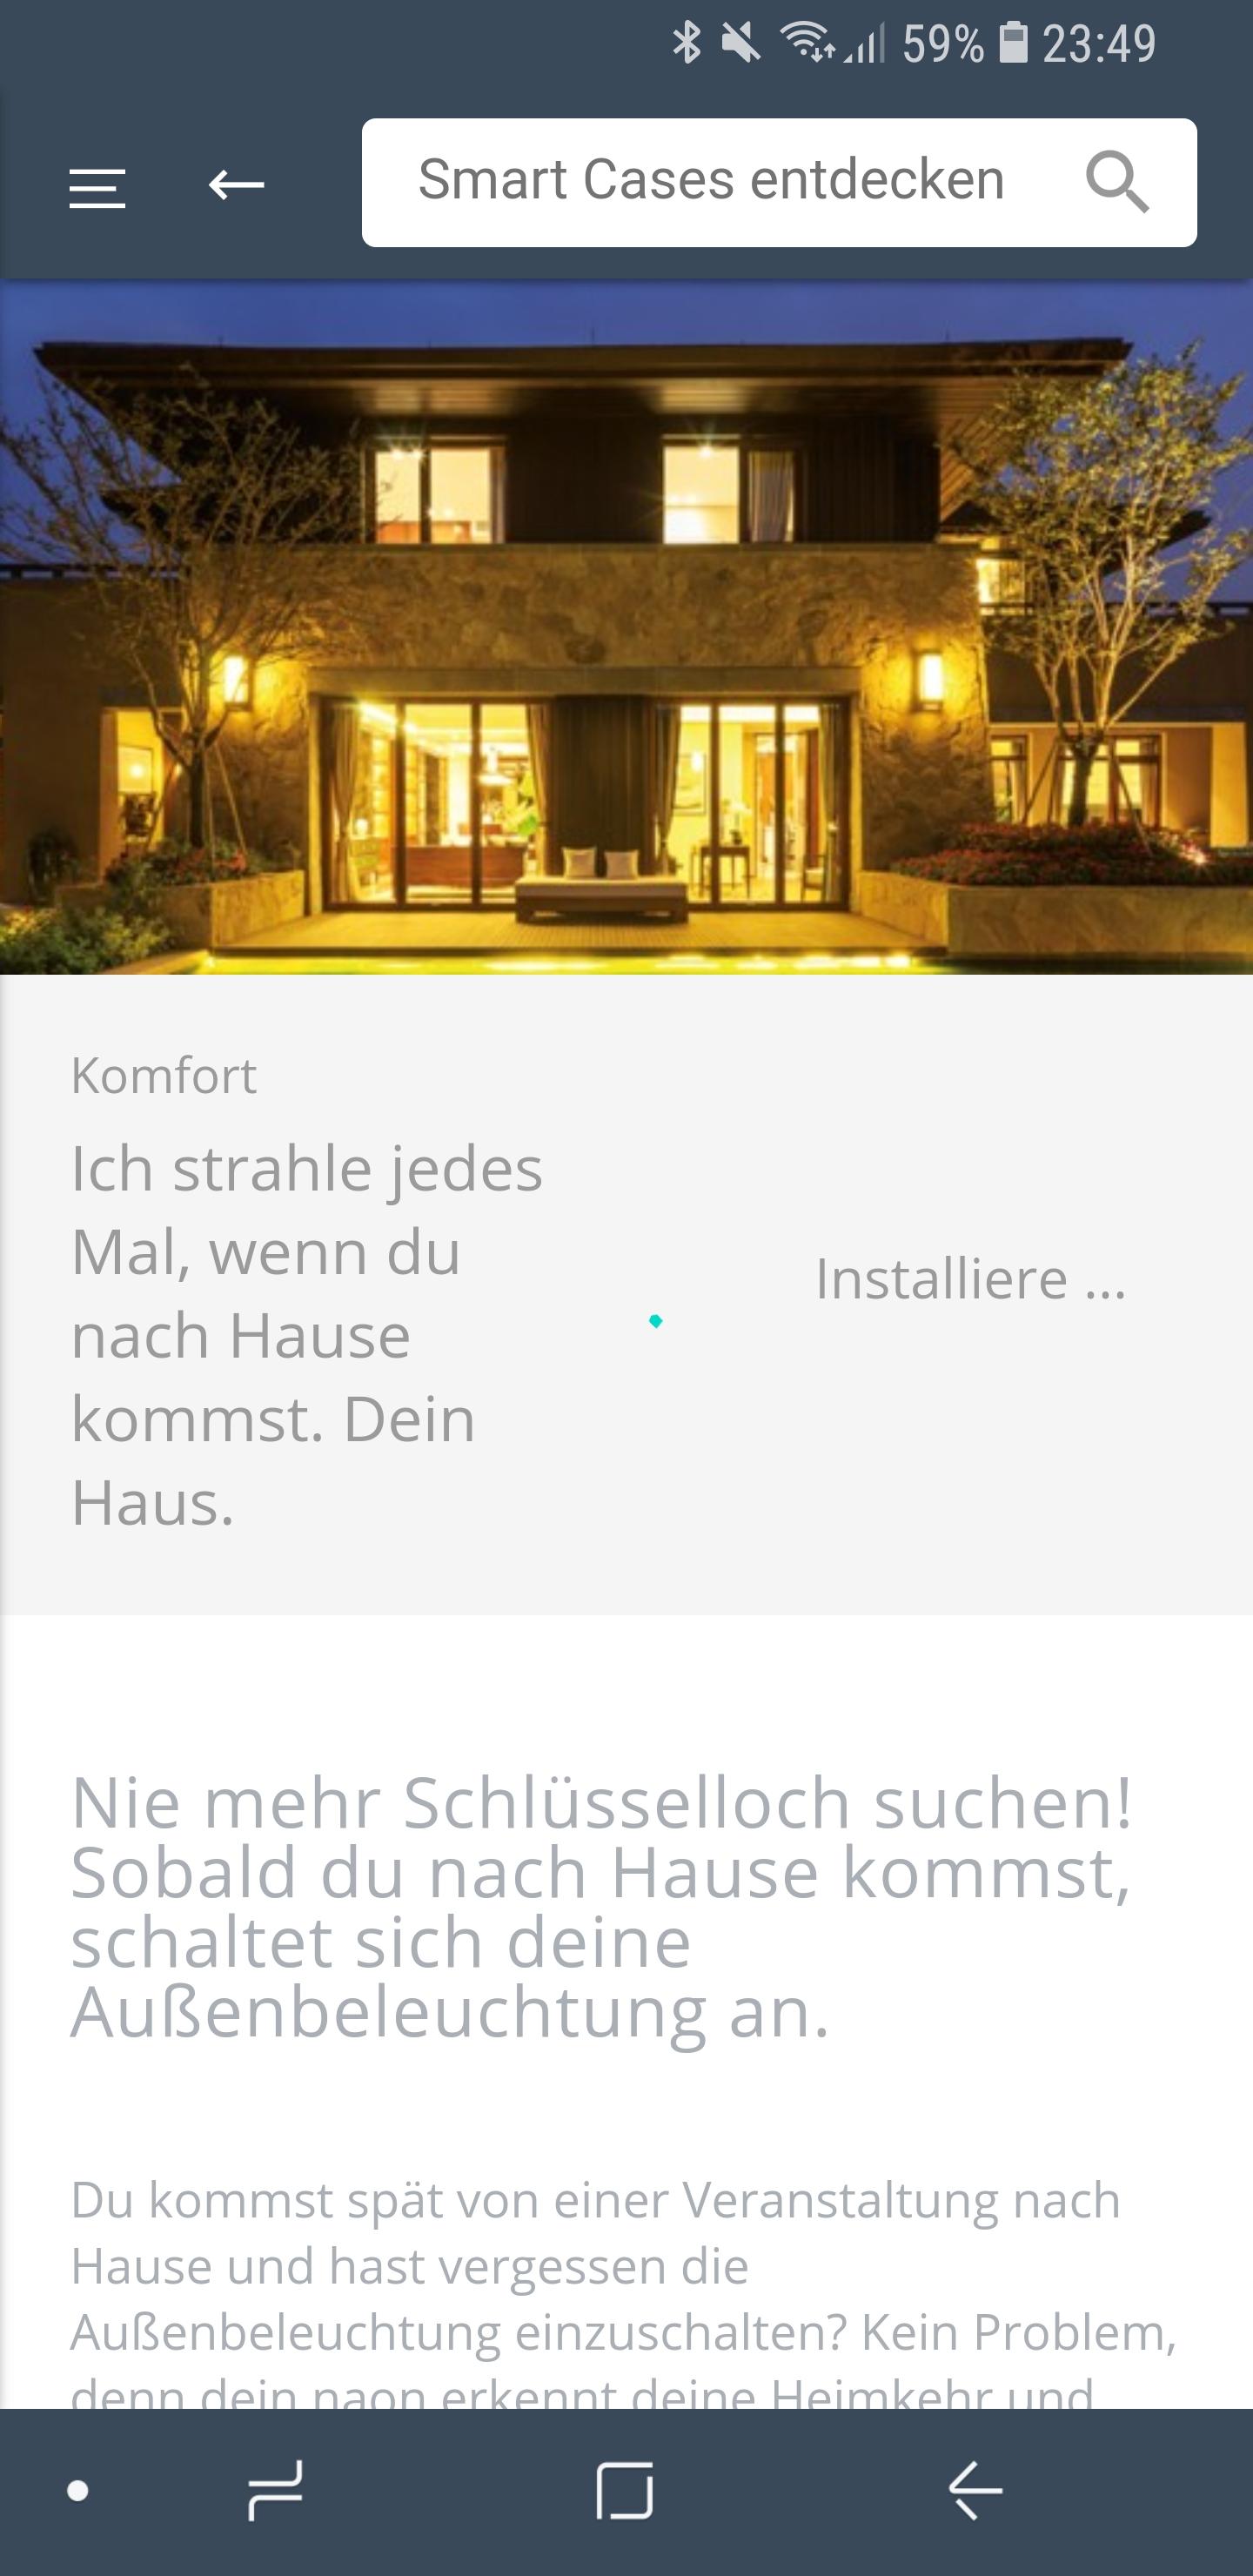 naon Bogen App Smartcase hinzufügen 03